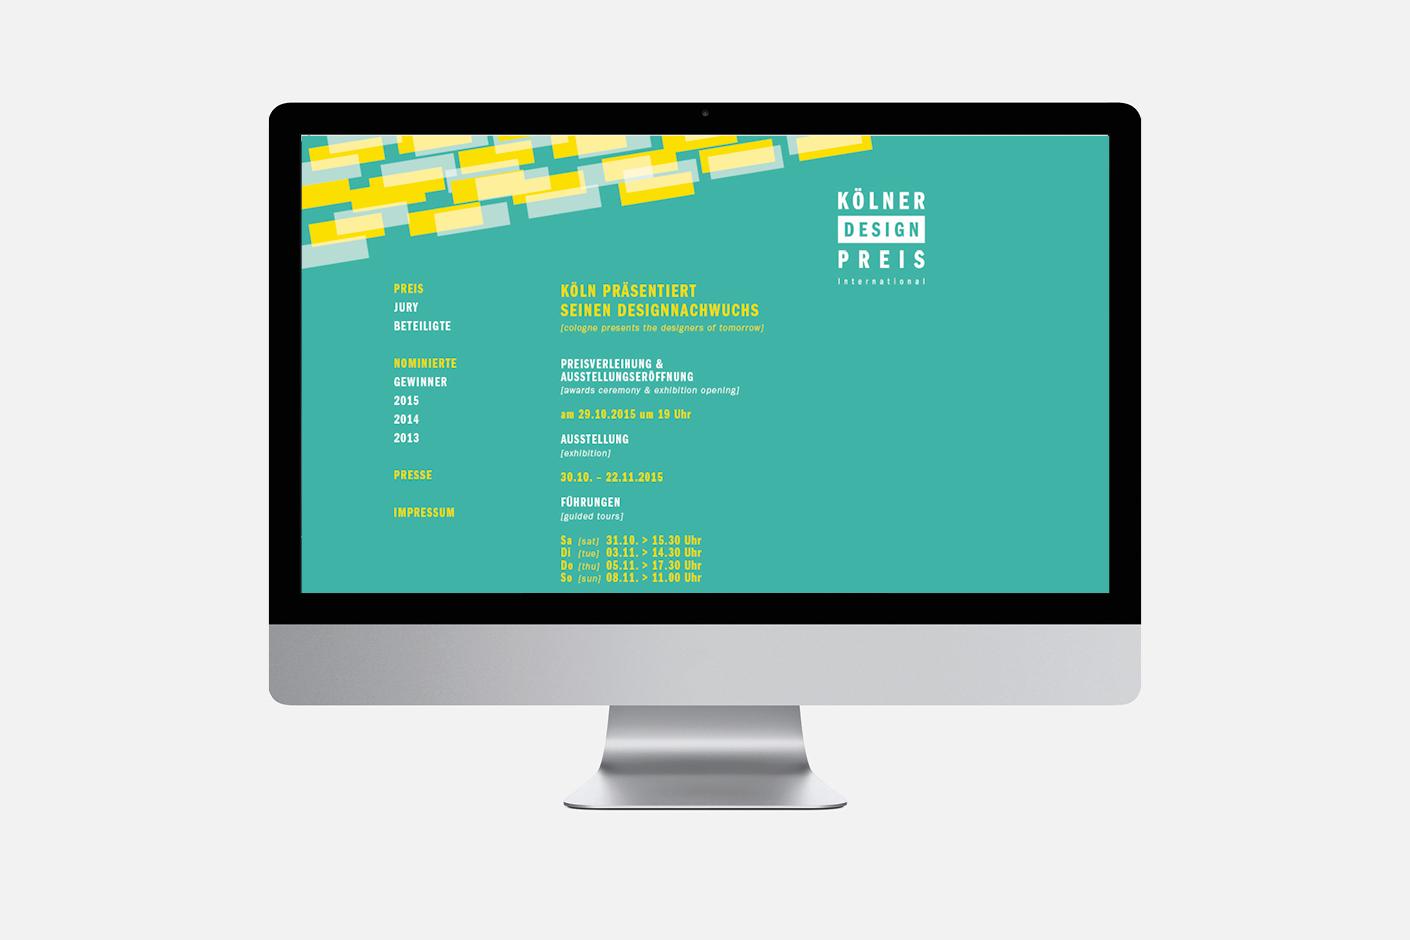 Kölner Design Preis – Website